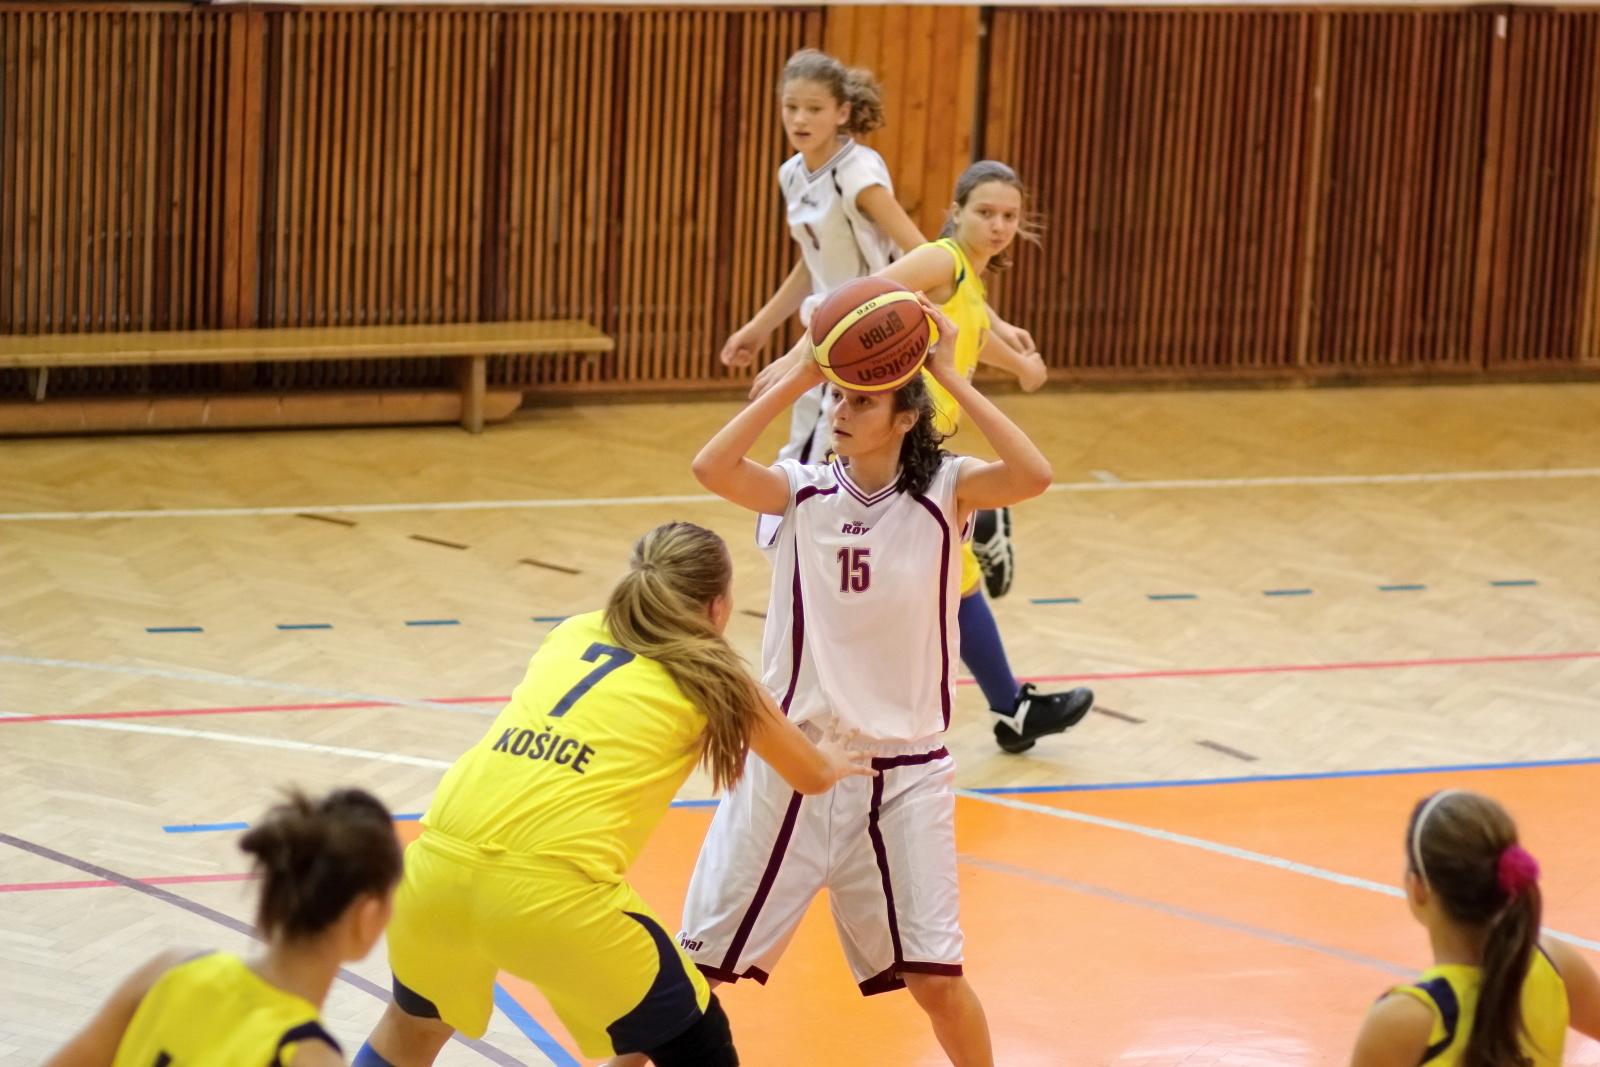 bk-zvolen-tydam-kosice-ziacky-basketbal-2011-19